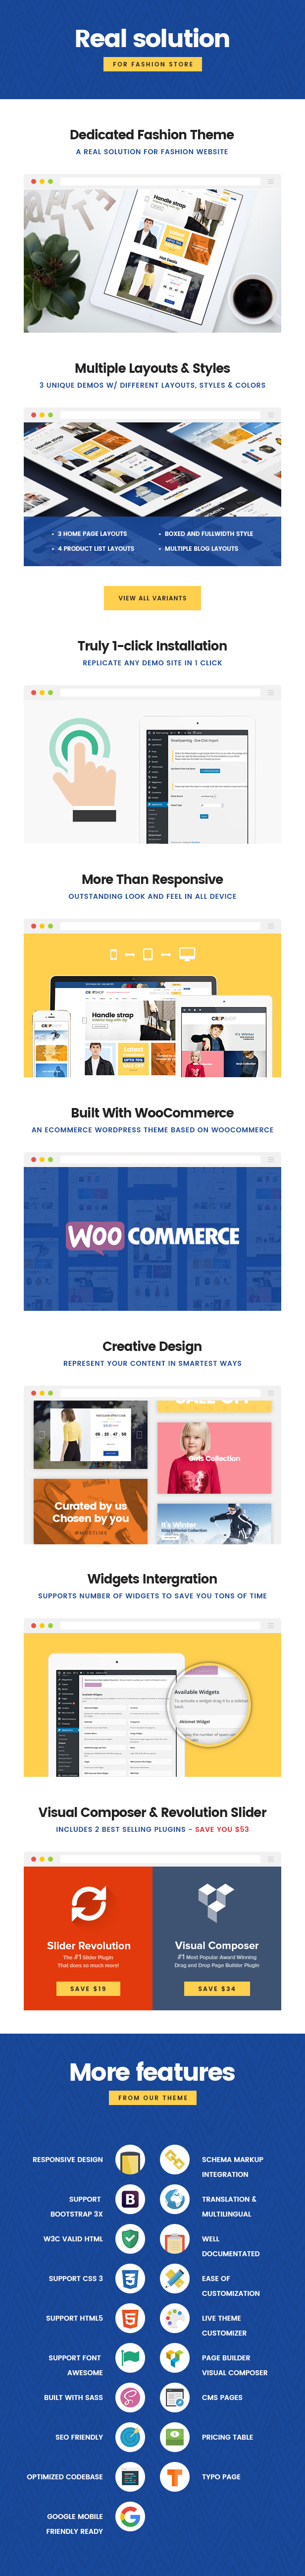 Woocommerce wordpress theme for fashion